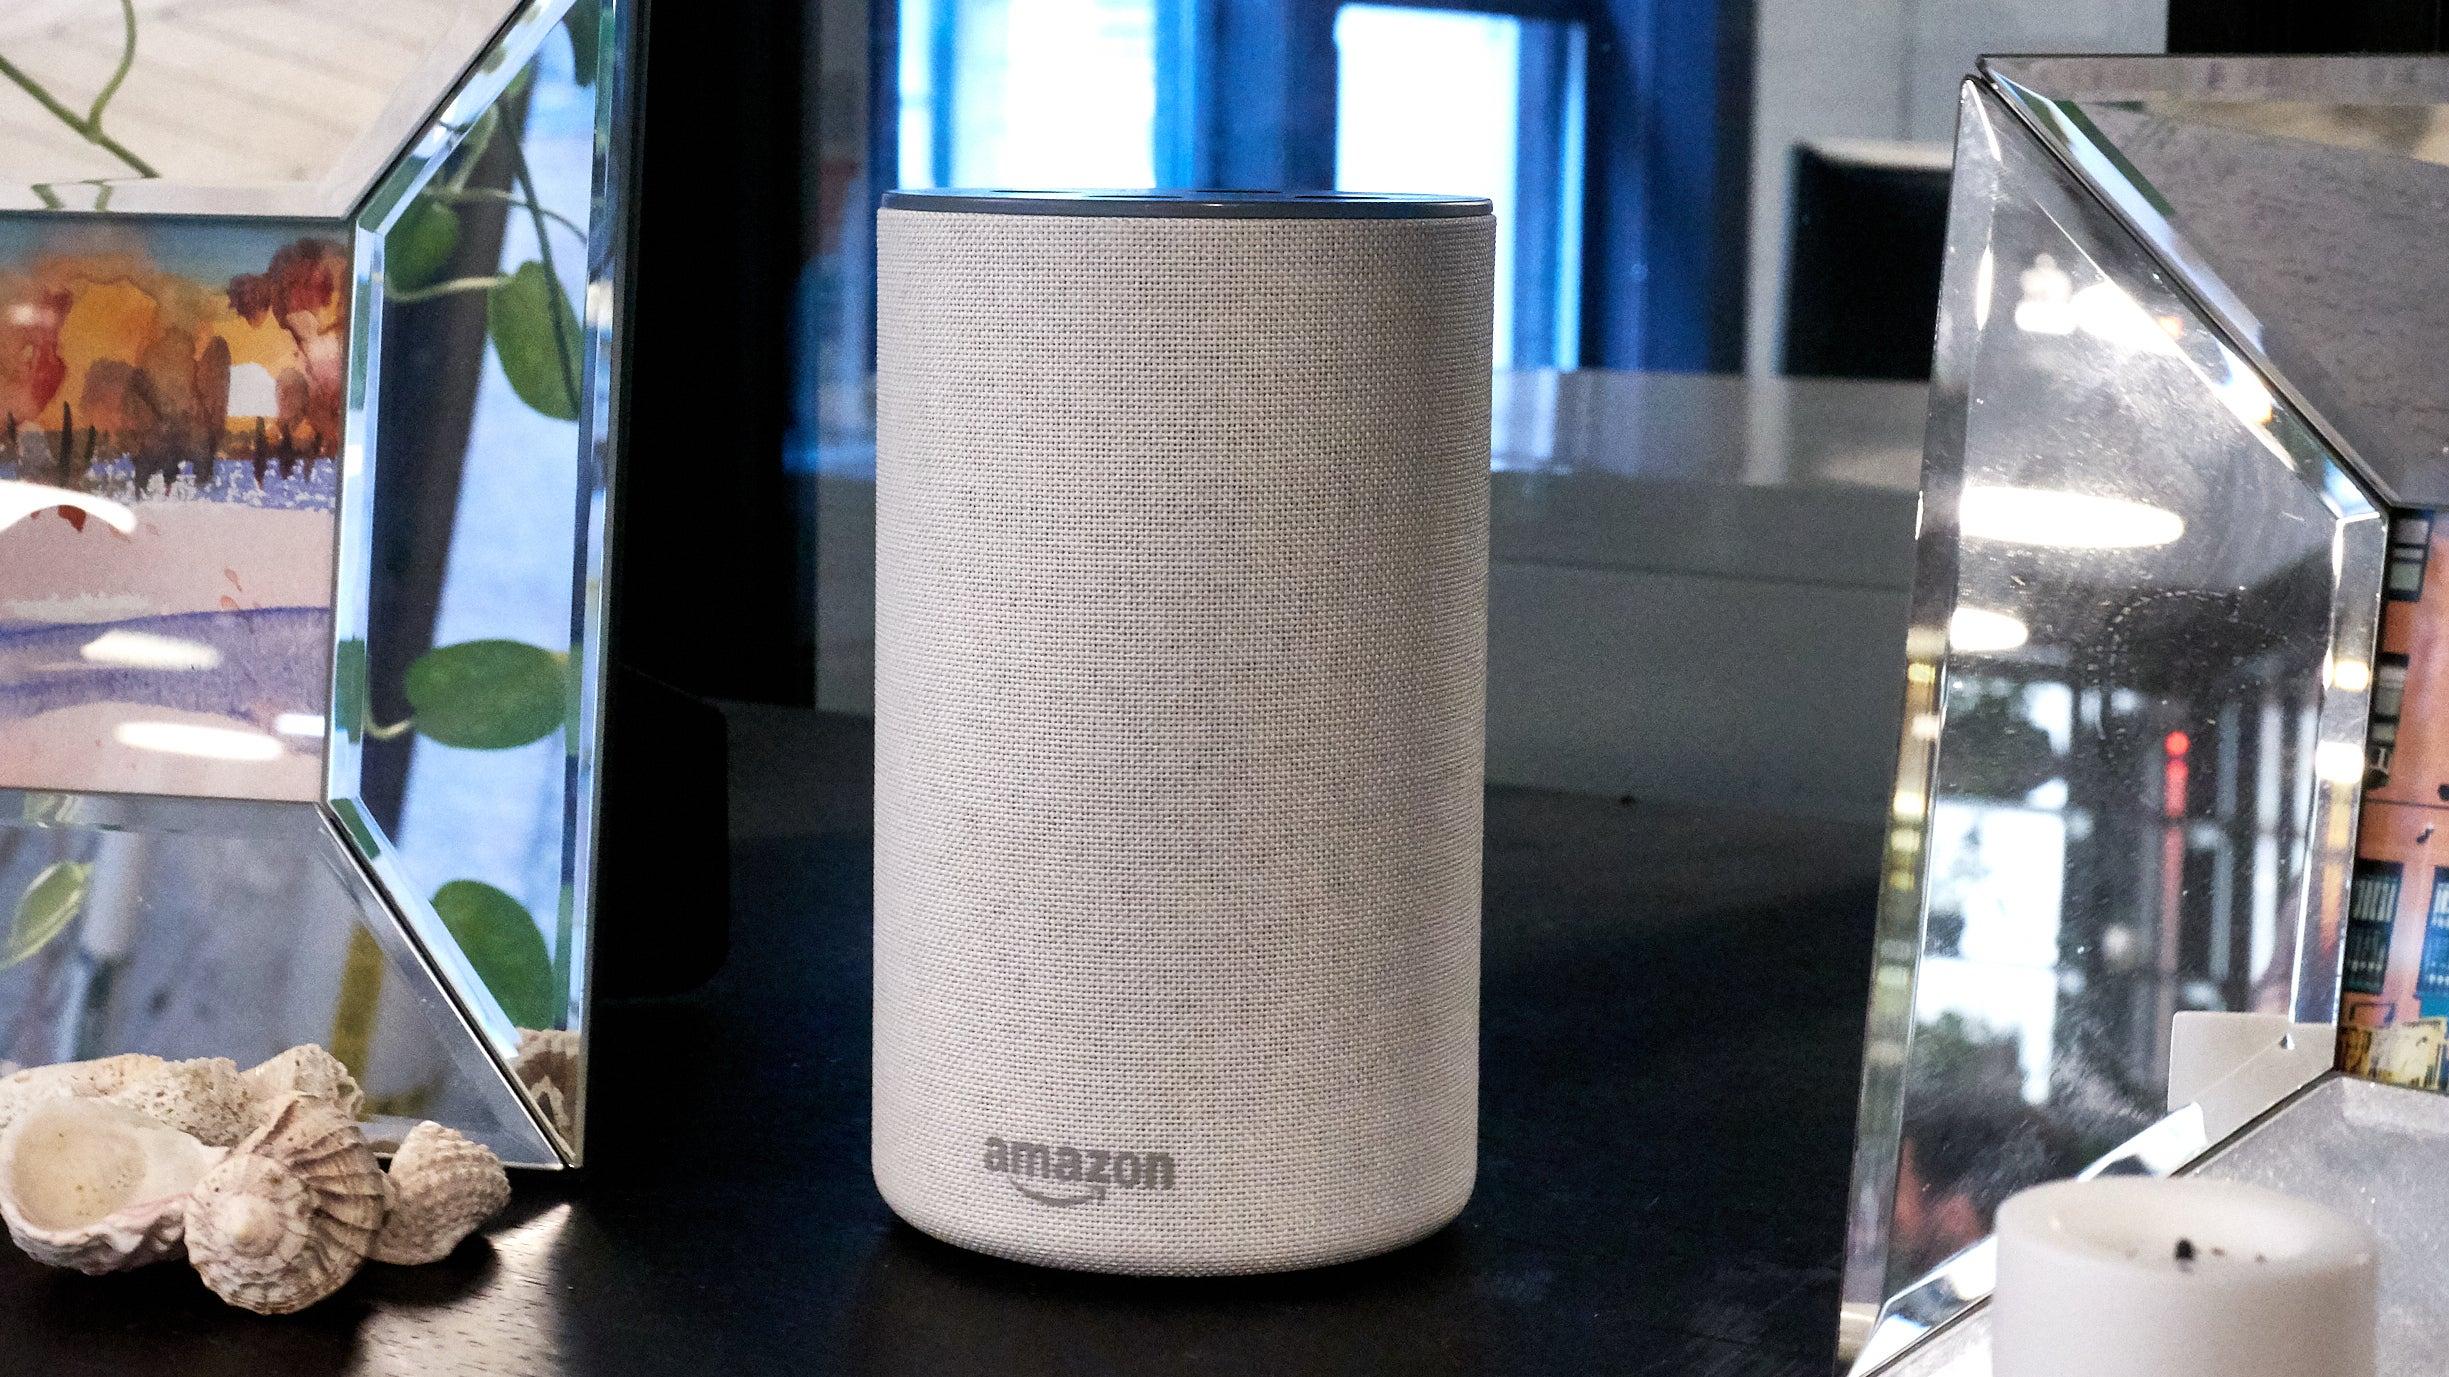 Amazon Confirms Alexa Heard A Couple's Background Conversation As A Command To Record Them